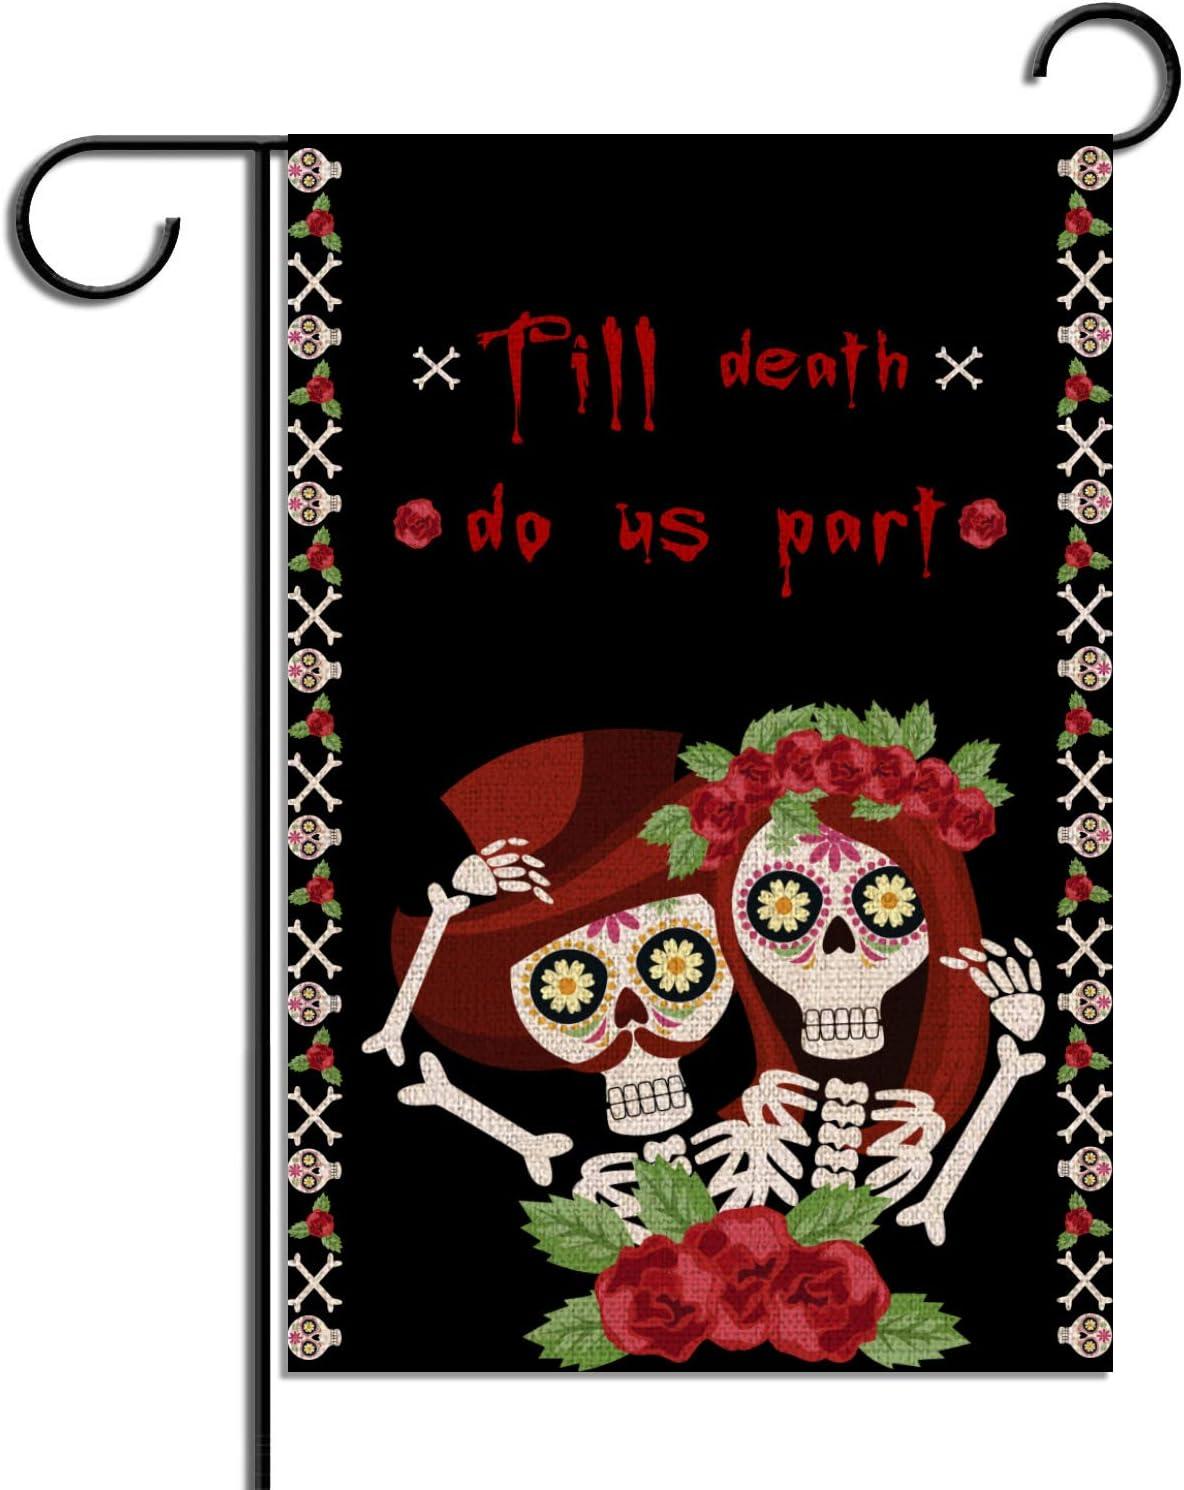 Rainlemon Sugar Skull Till Death Do Us Part Garden Flag Vertical Double Sized Mexico The Day of The Dead Yard Outdoor Decoration